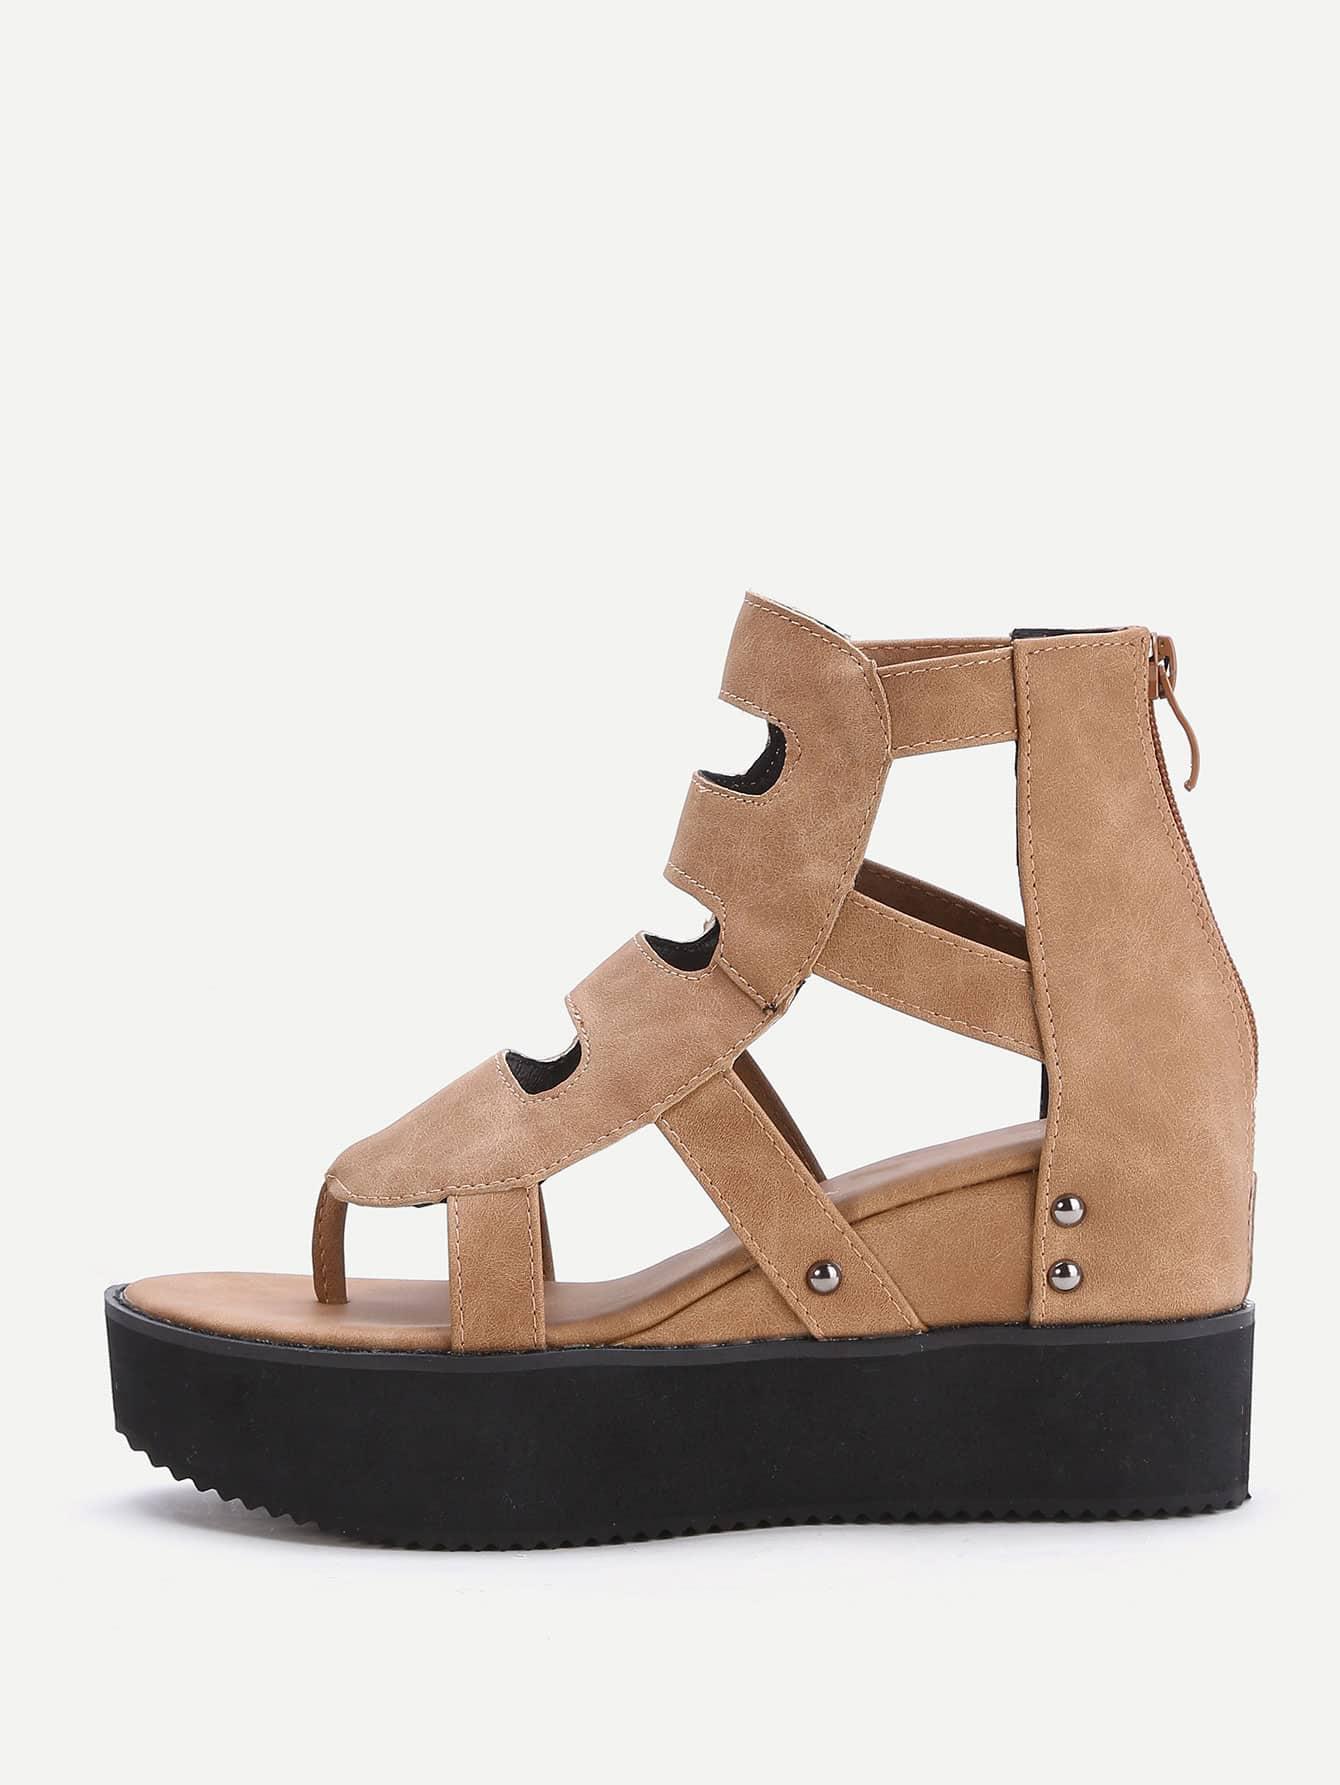 Фото Khaki Cutout Toe Post Flatform Sandals. Купить с доставкой